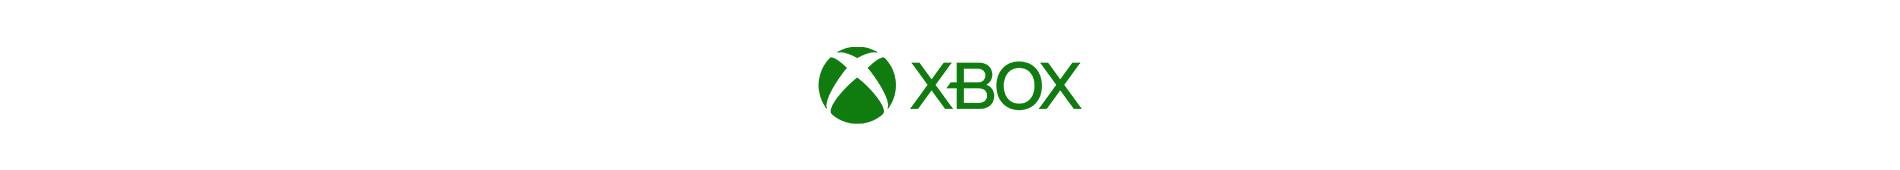 Microsoft Xbox One General Nav Buttons  Btm Banner Tile 16